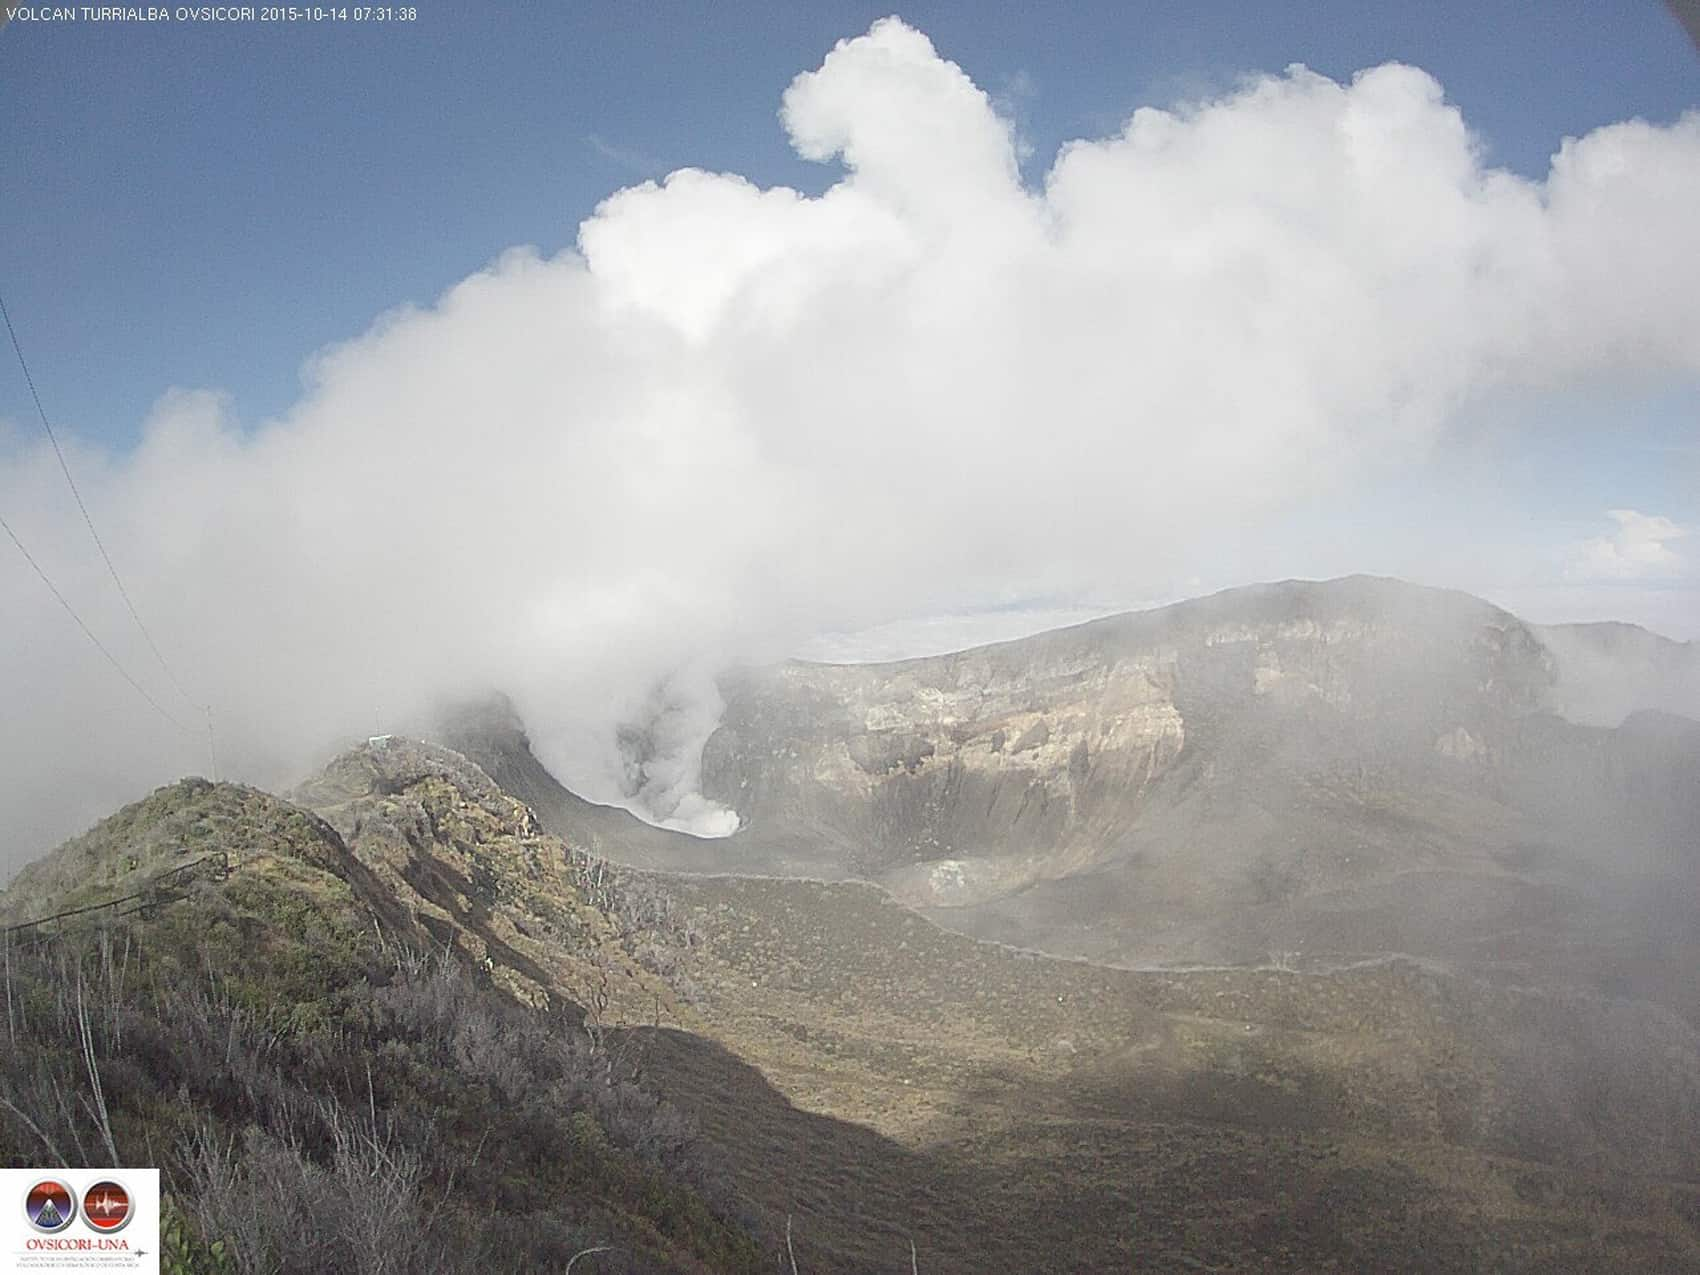 Turrialba Volcano crater